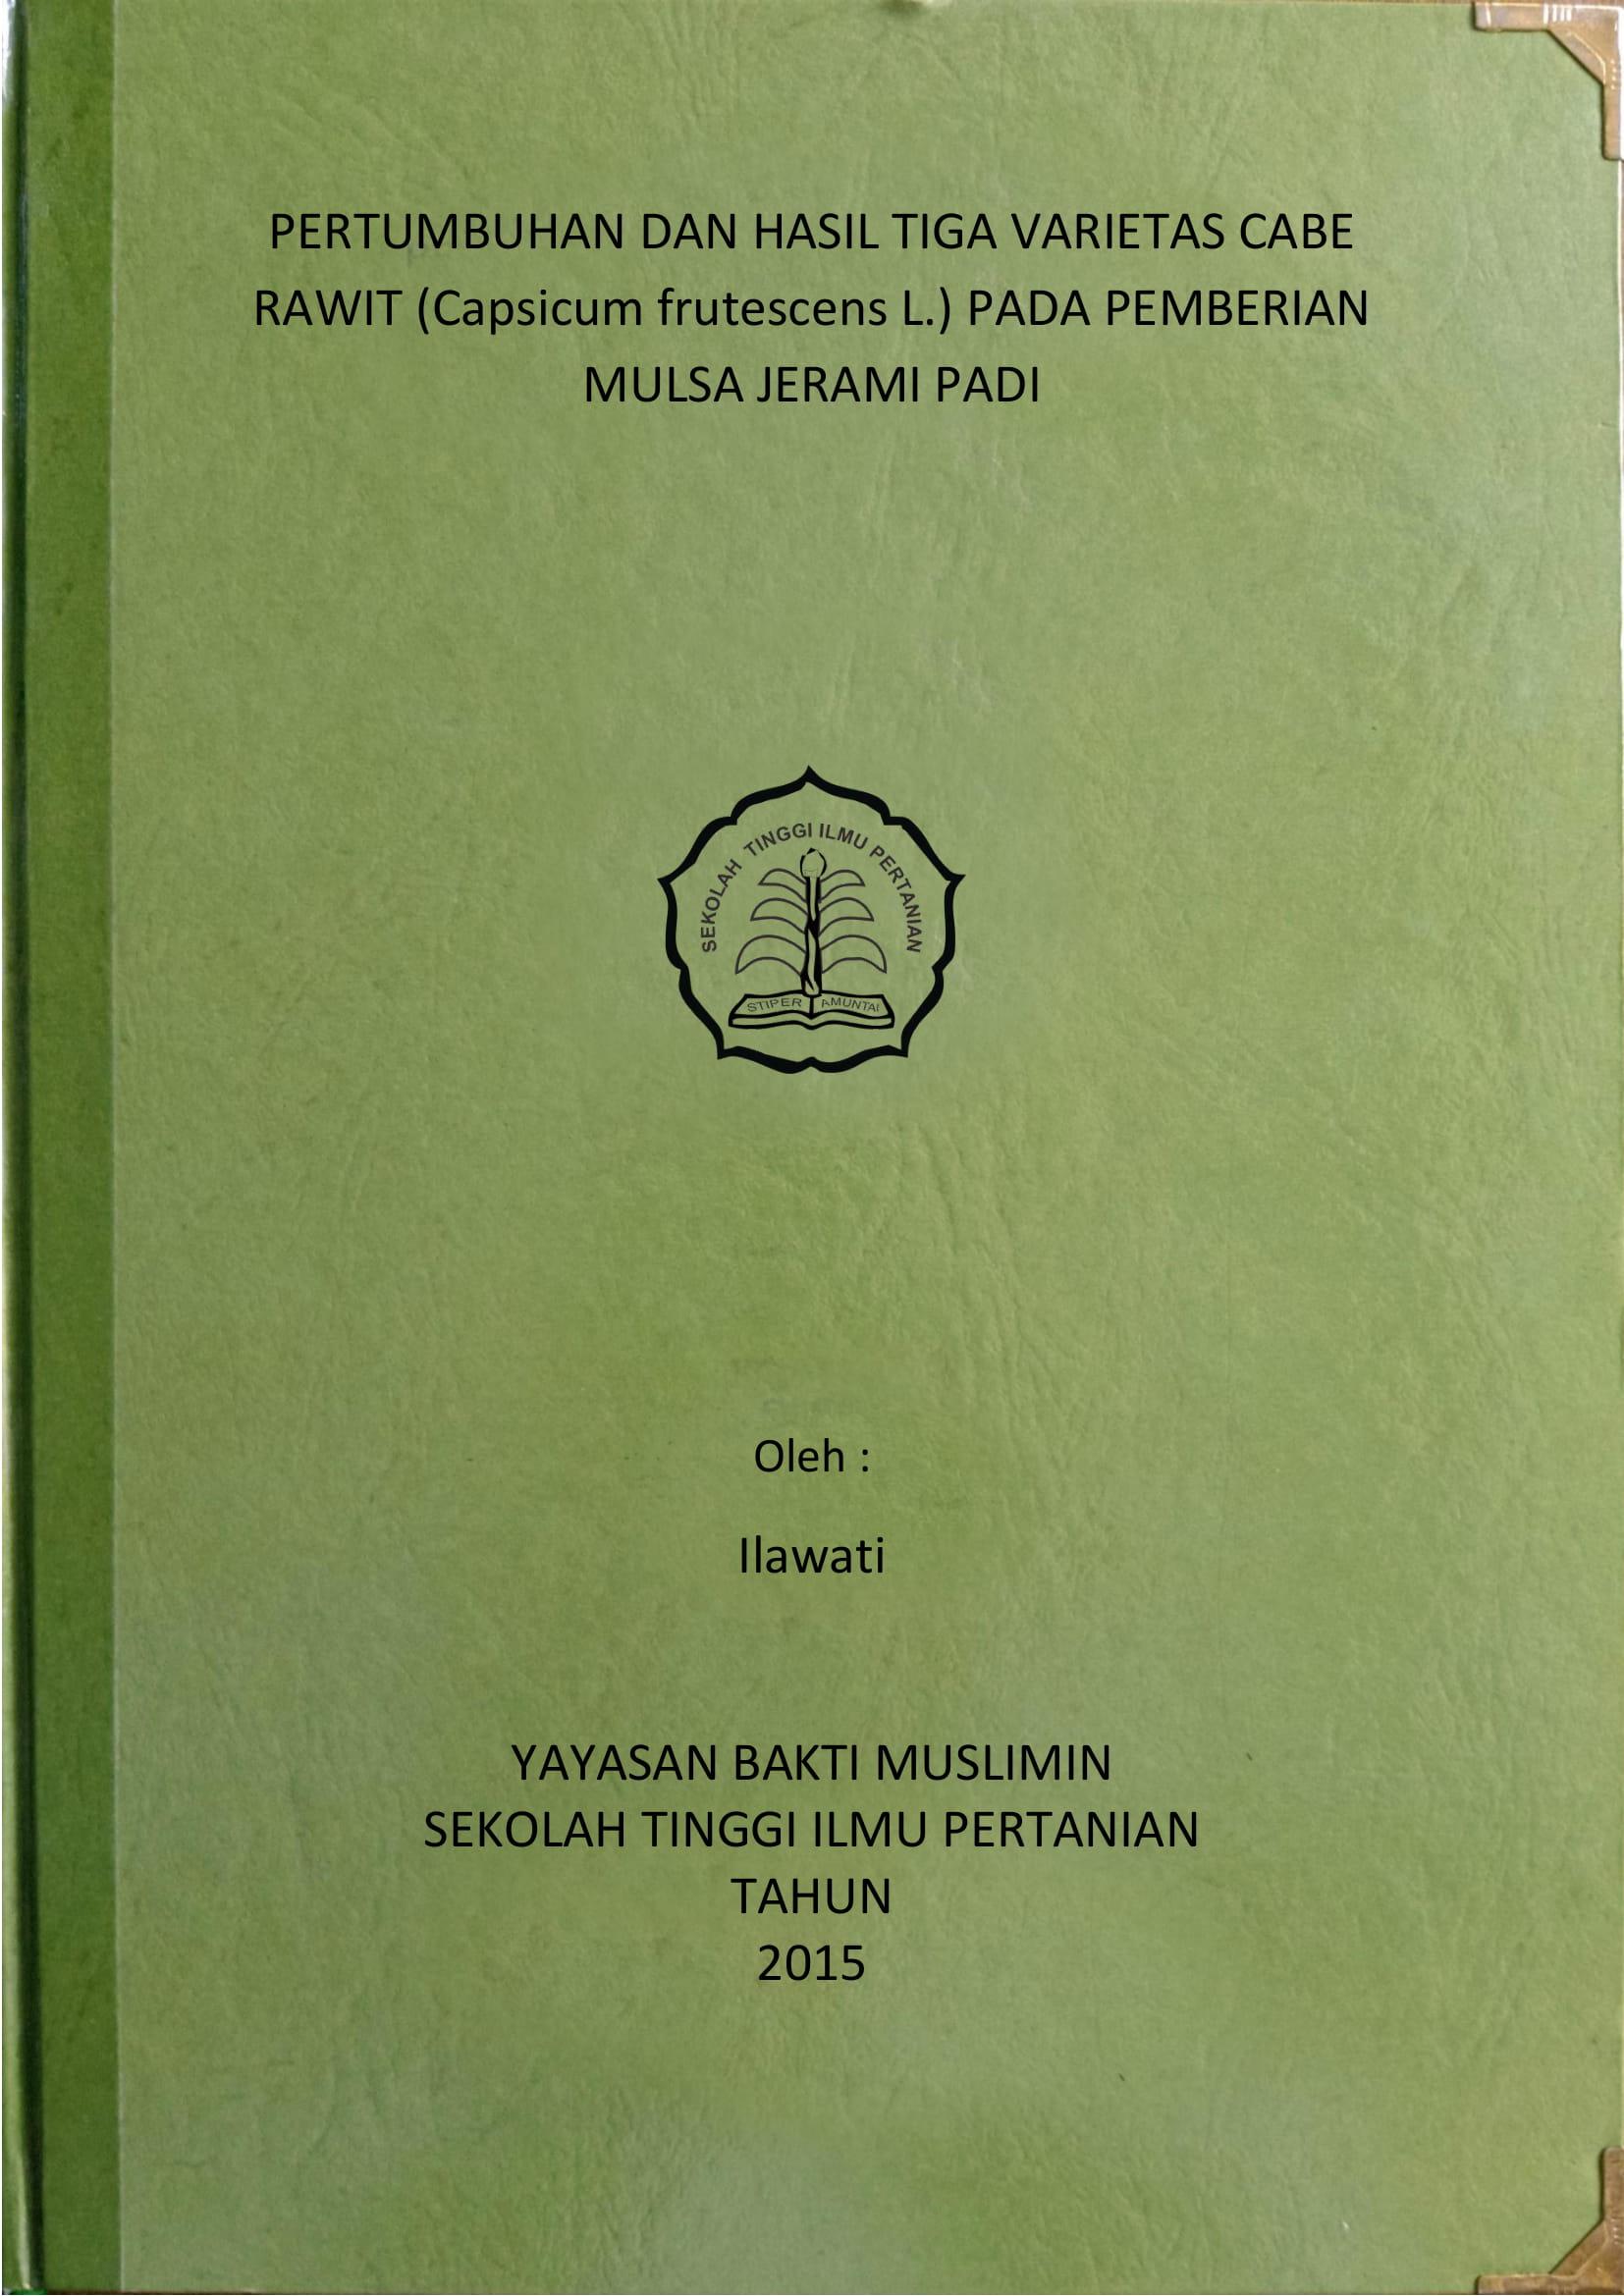 THP-21